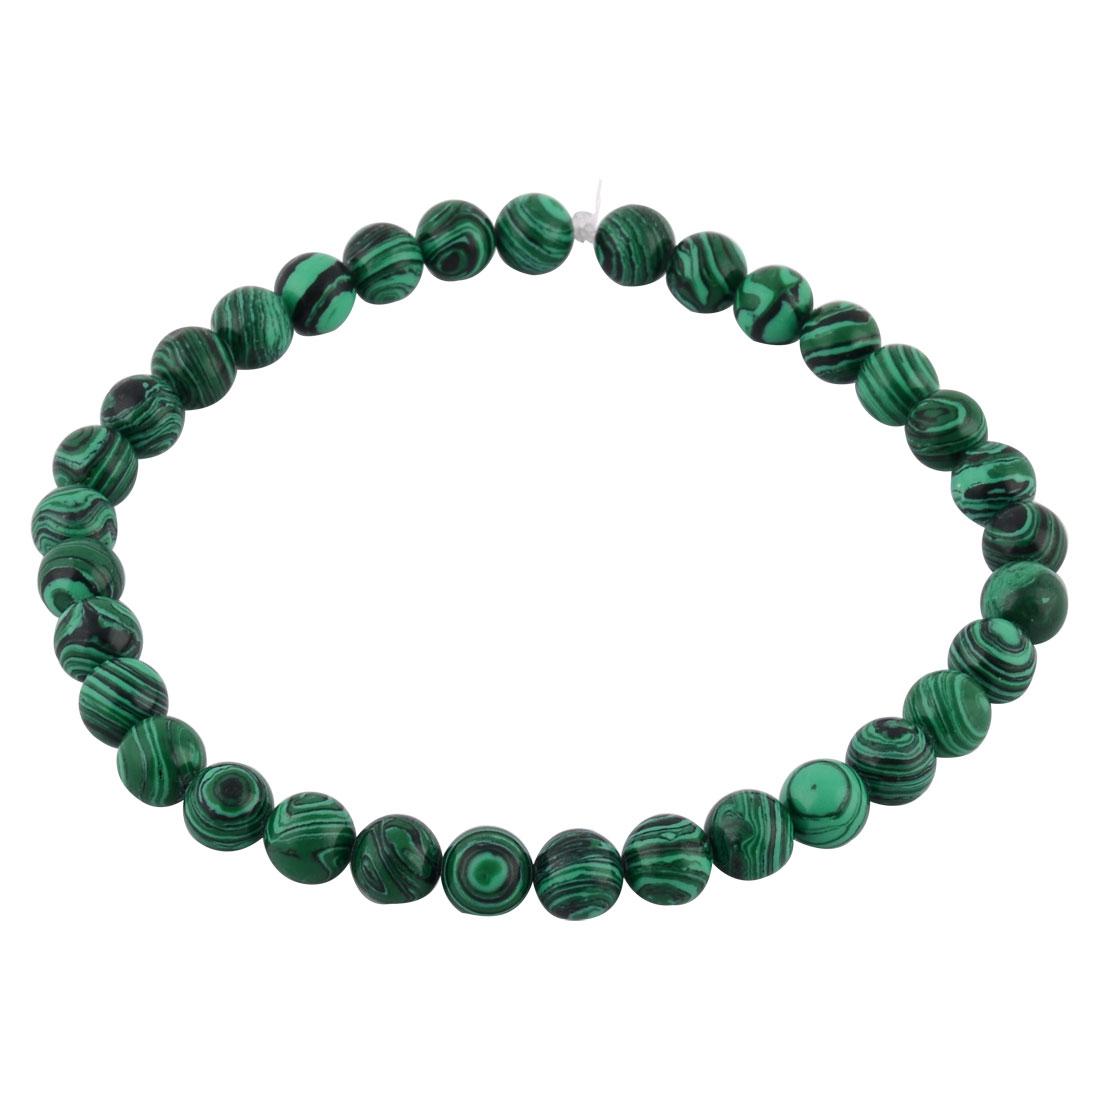 Malachite Grain DIY Beading Decor Necklace Bracelet Beads Strand 1.2cm Dia